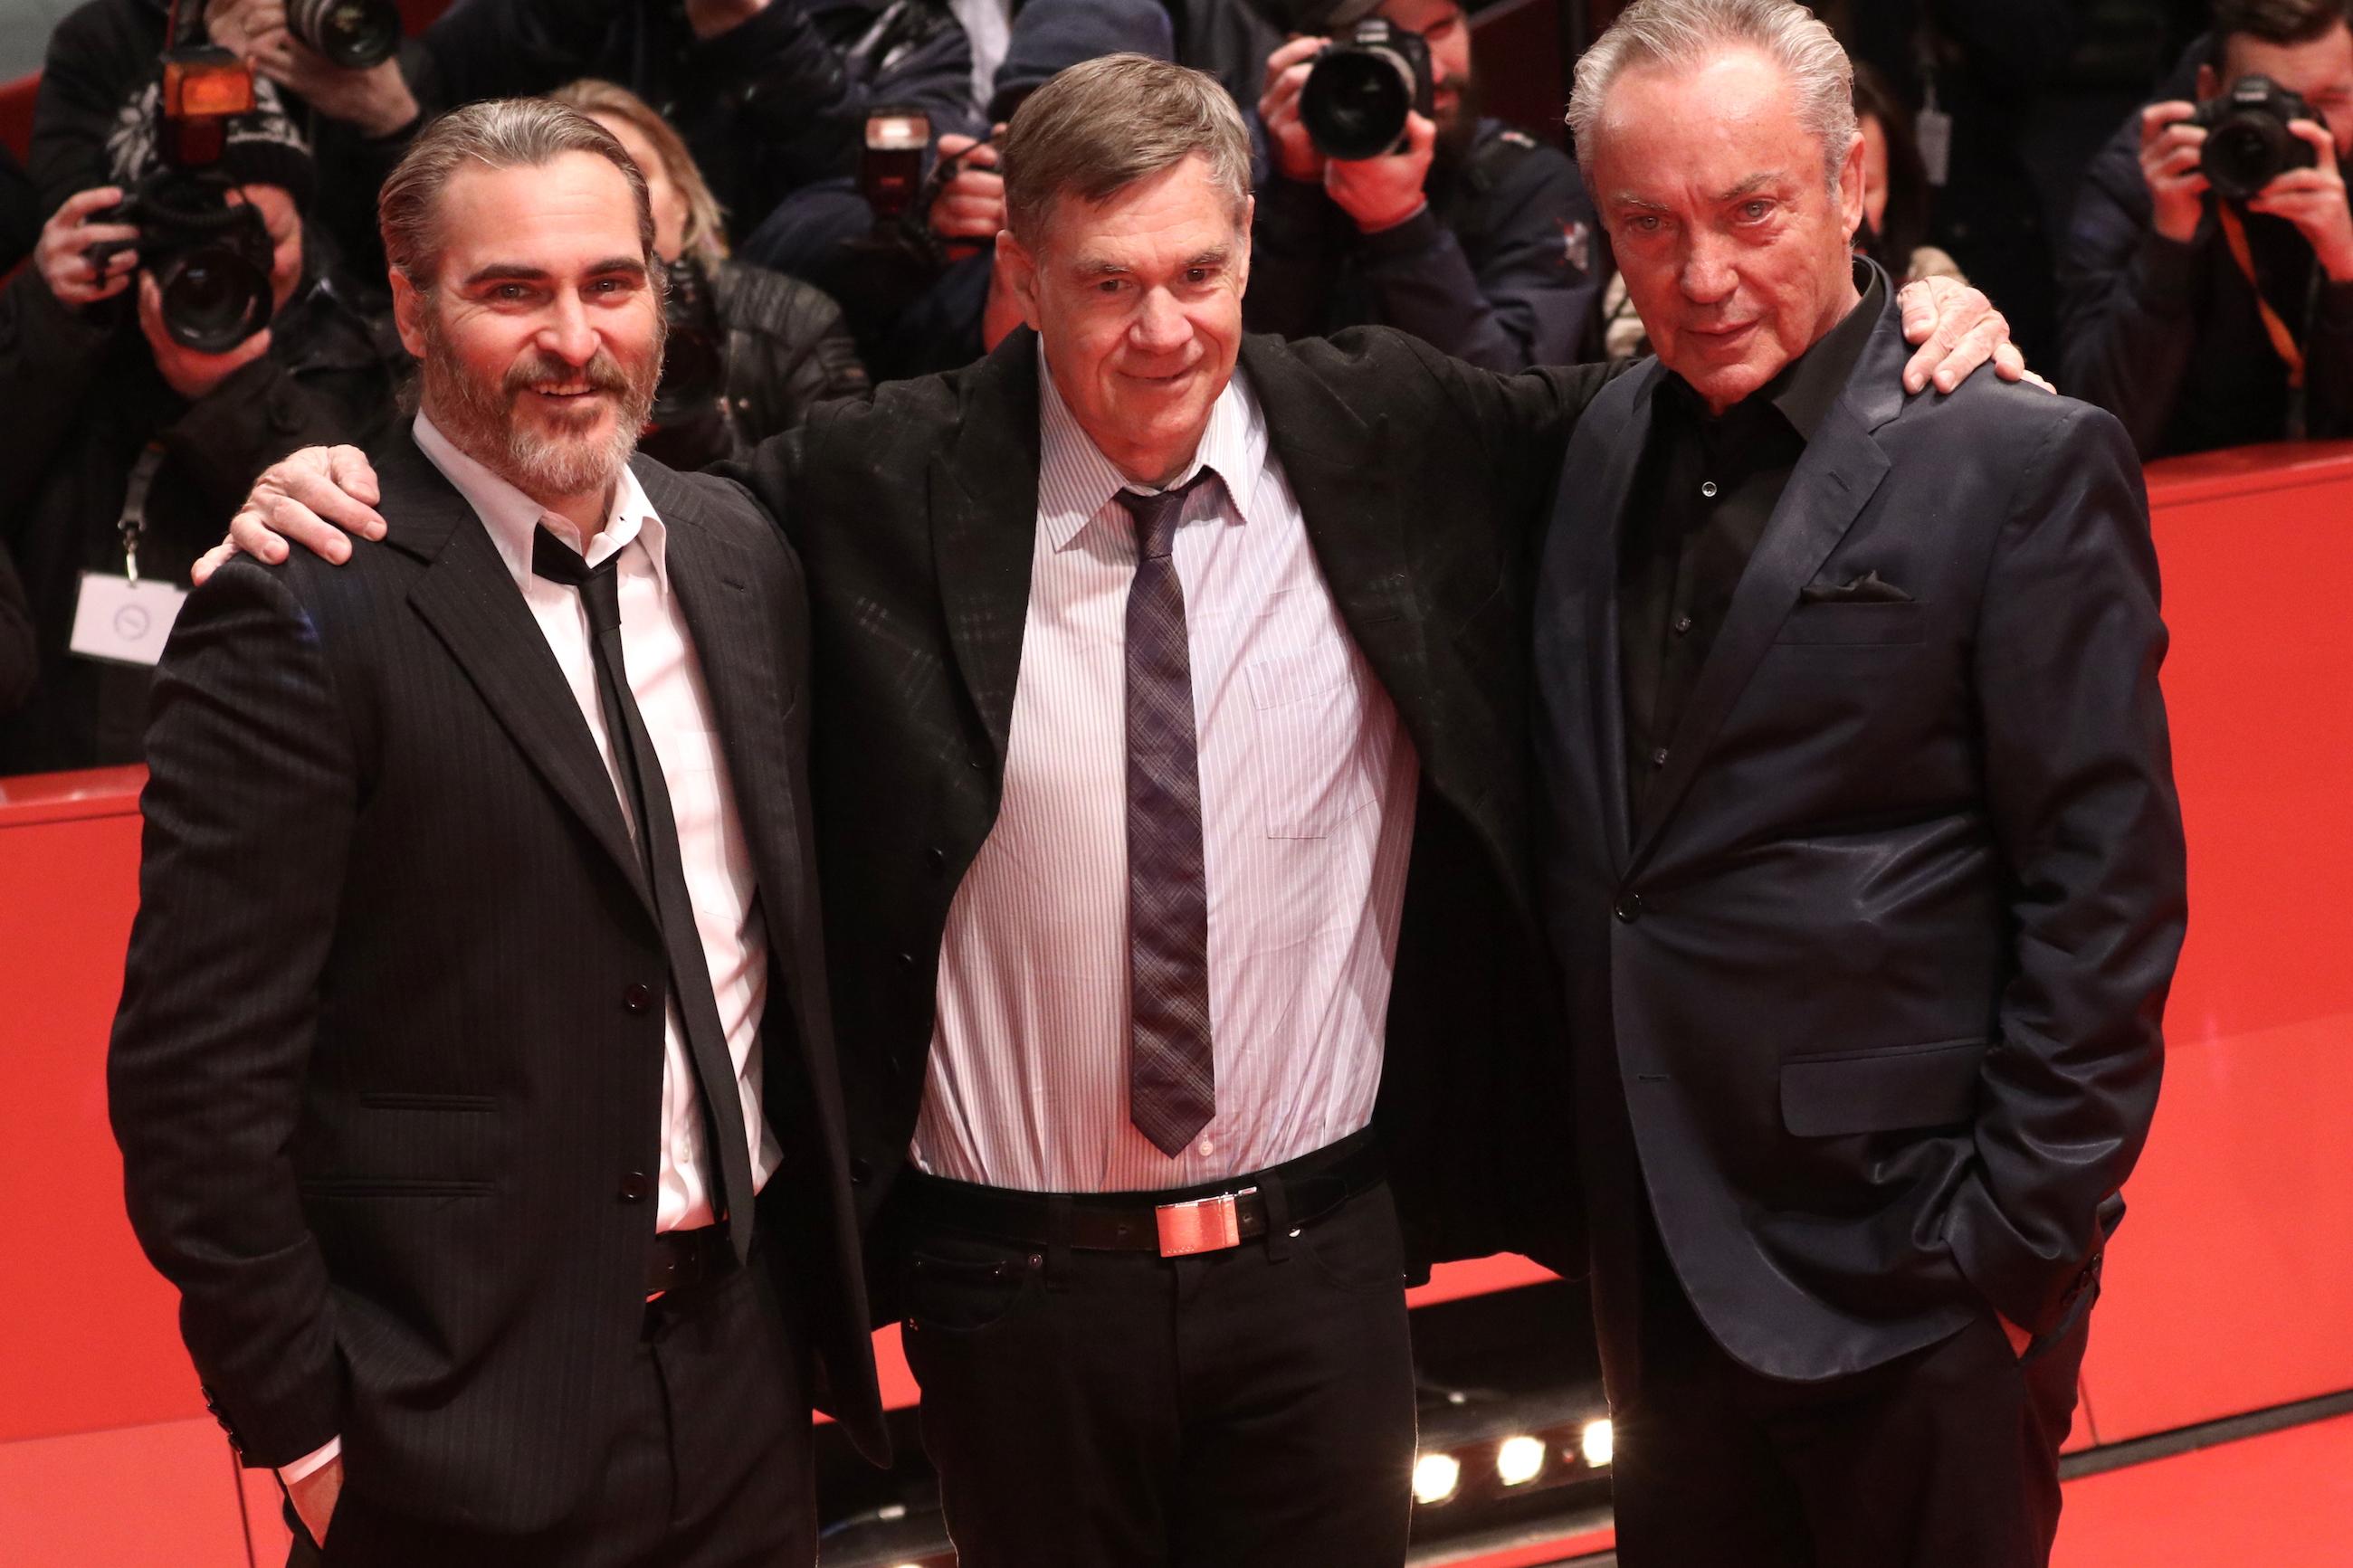 Berlino 2018: Joaquin Phoenix, Gus Van Sant, Udo Kier sul red carpet di Don't Worry, He Won't Get Far On Foot